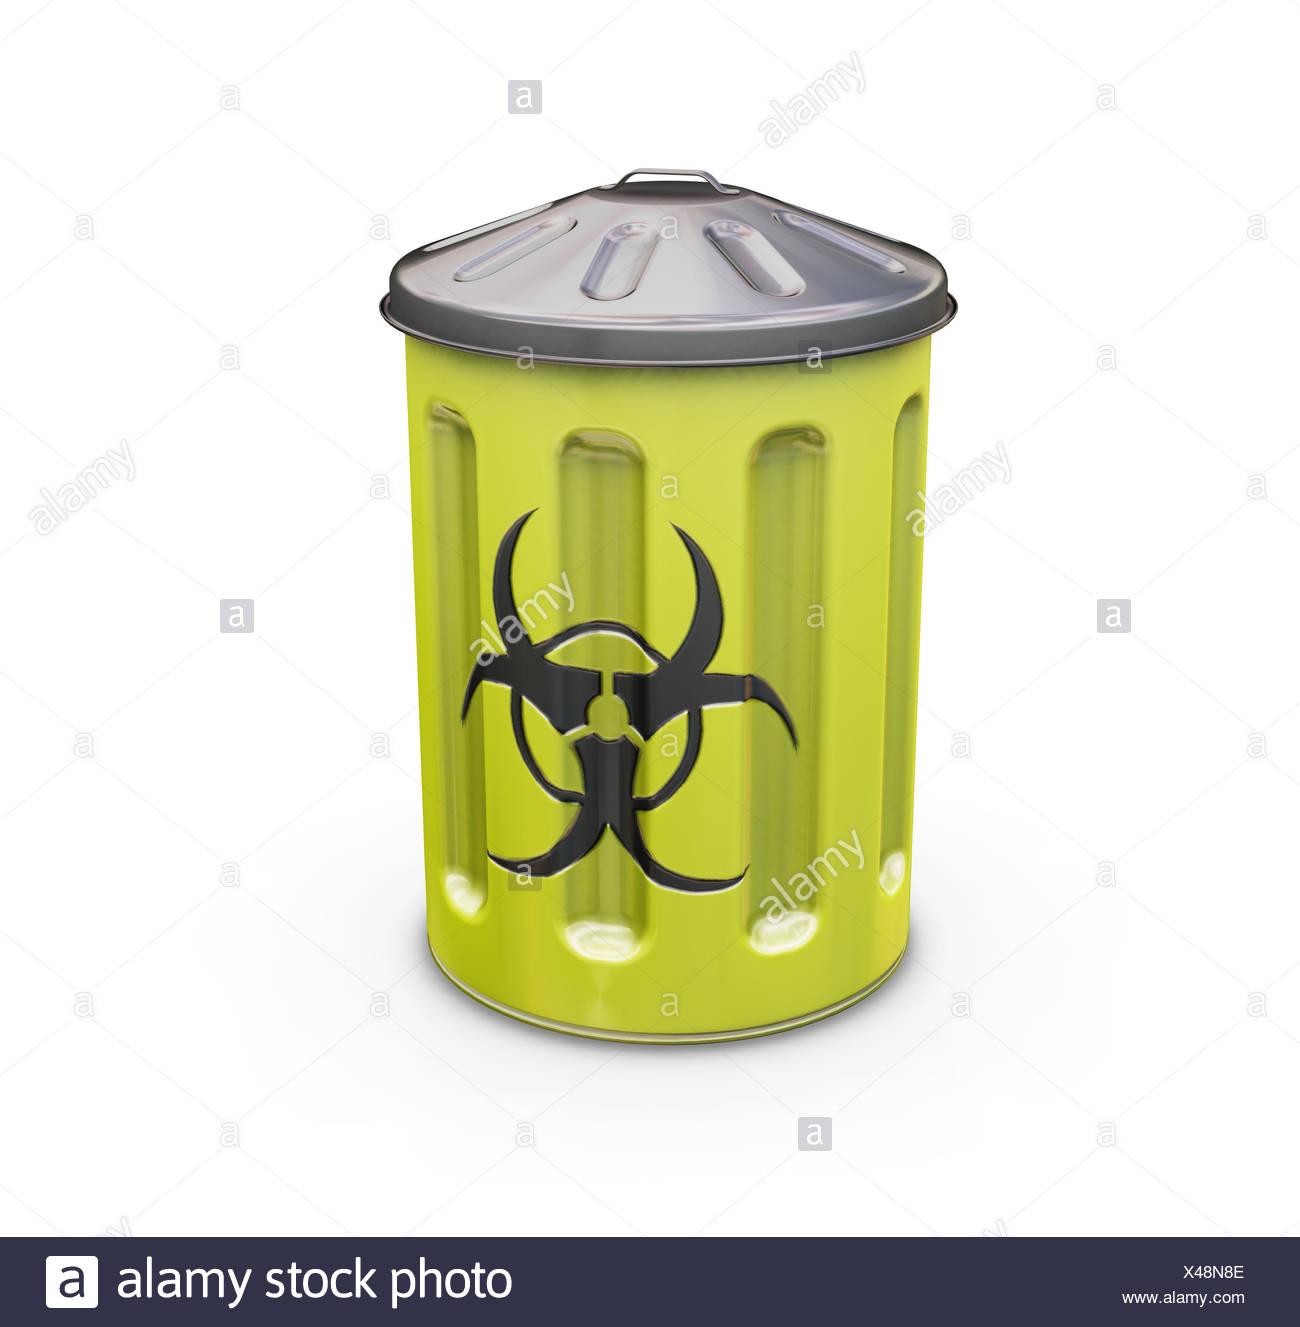 danger hazardous hazard Stock Photo